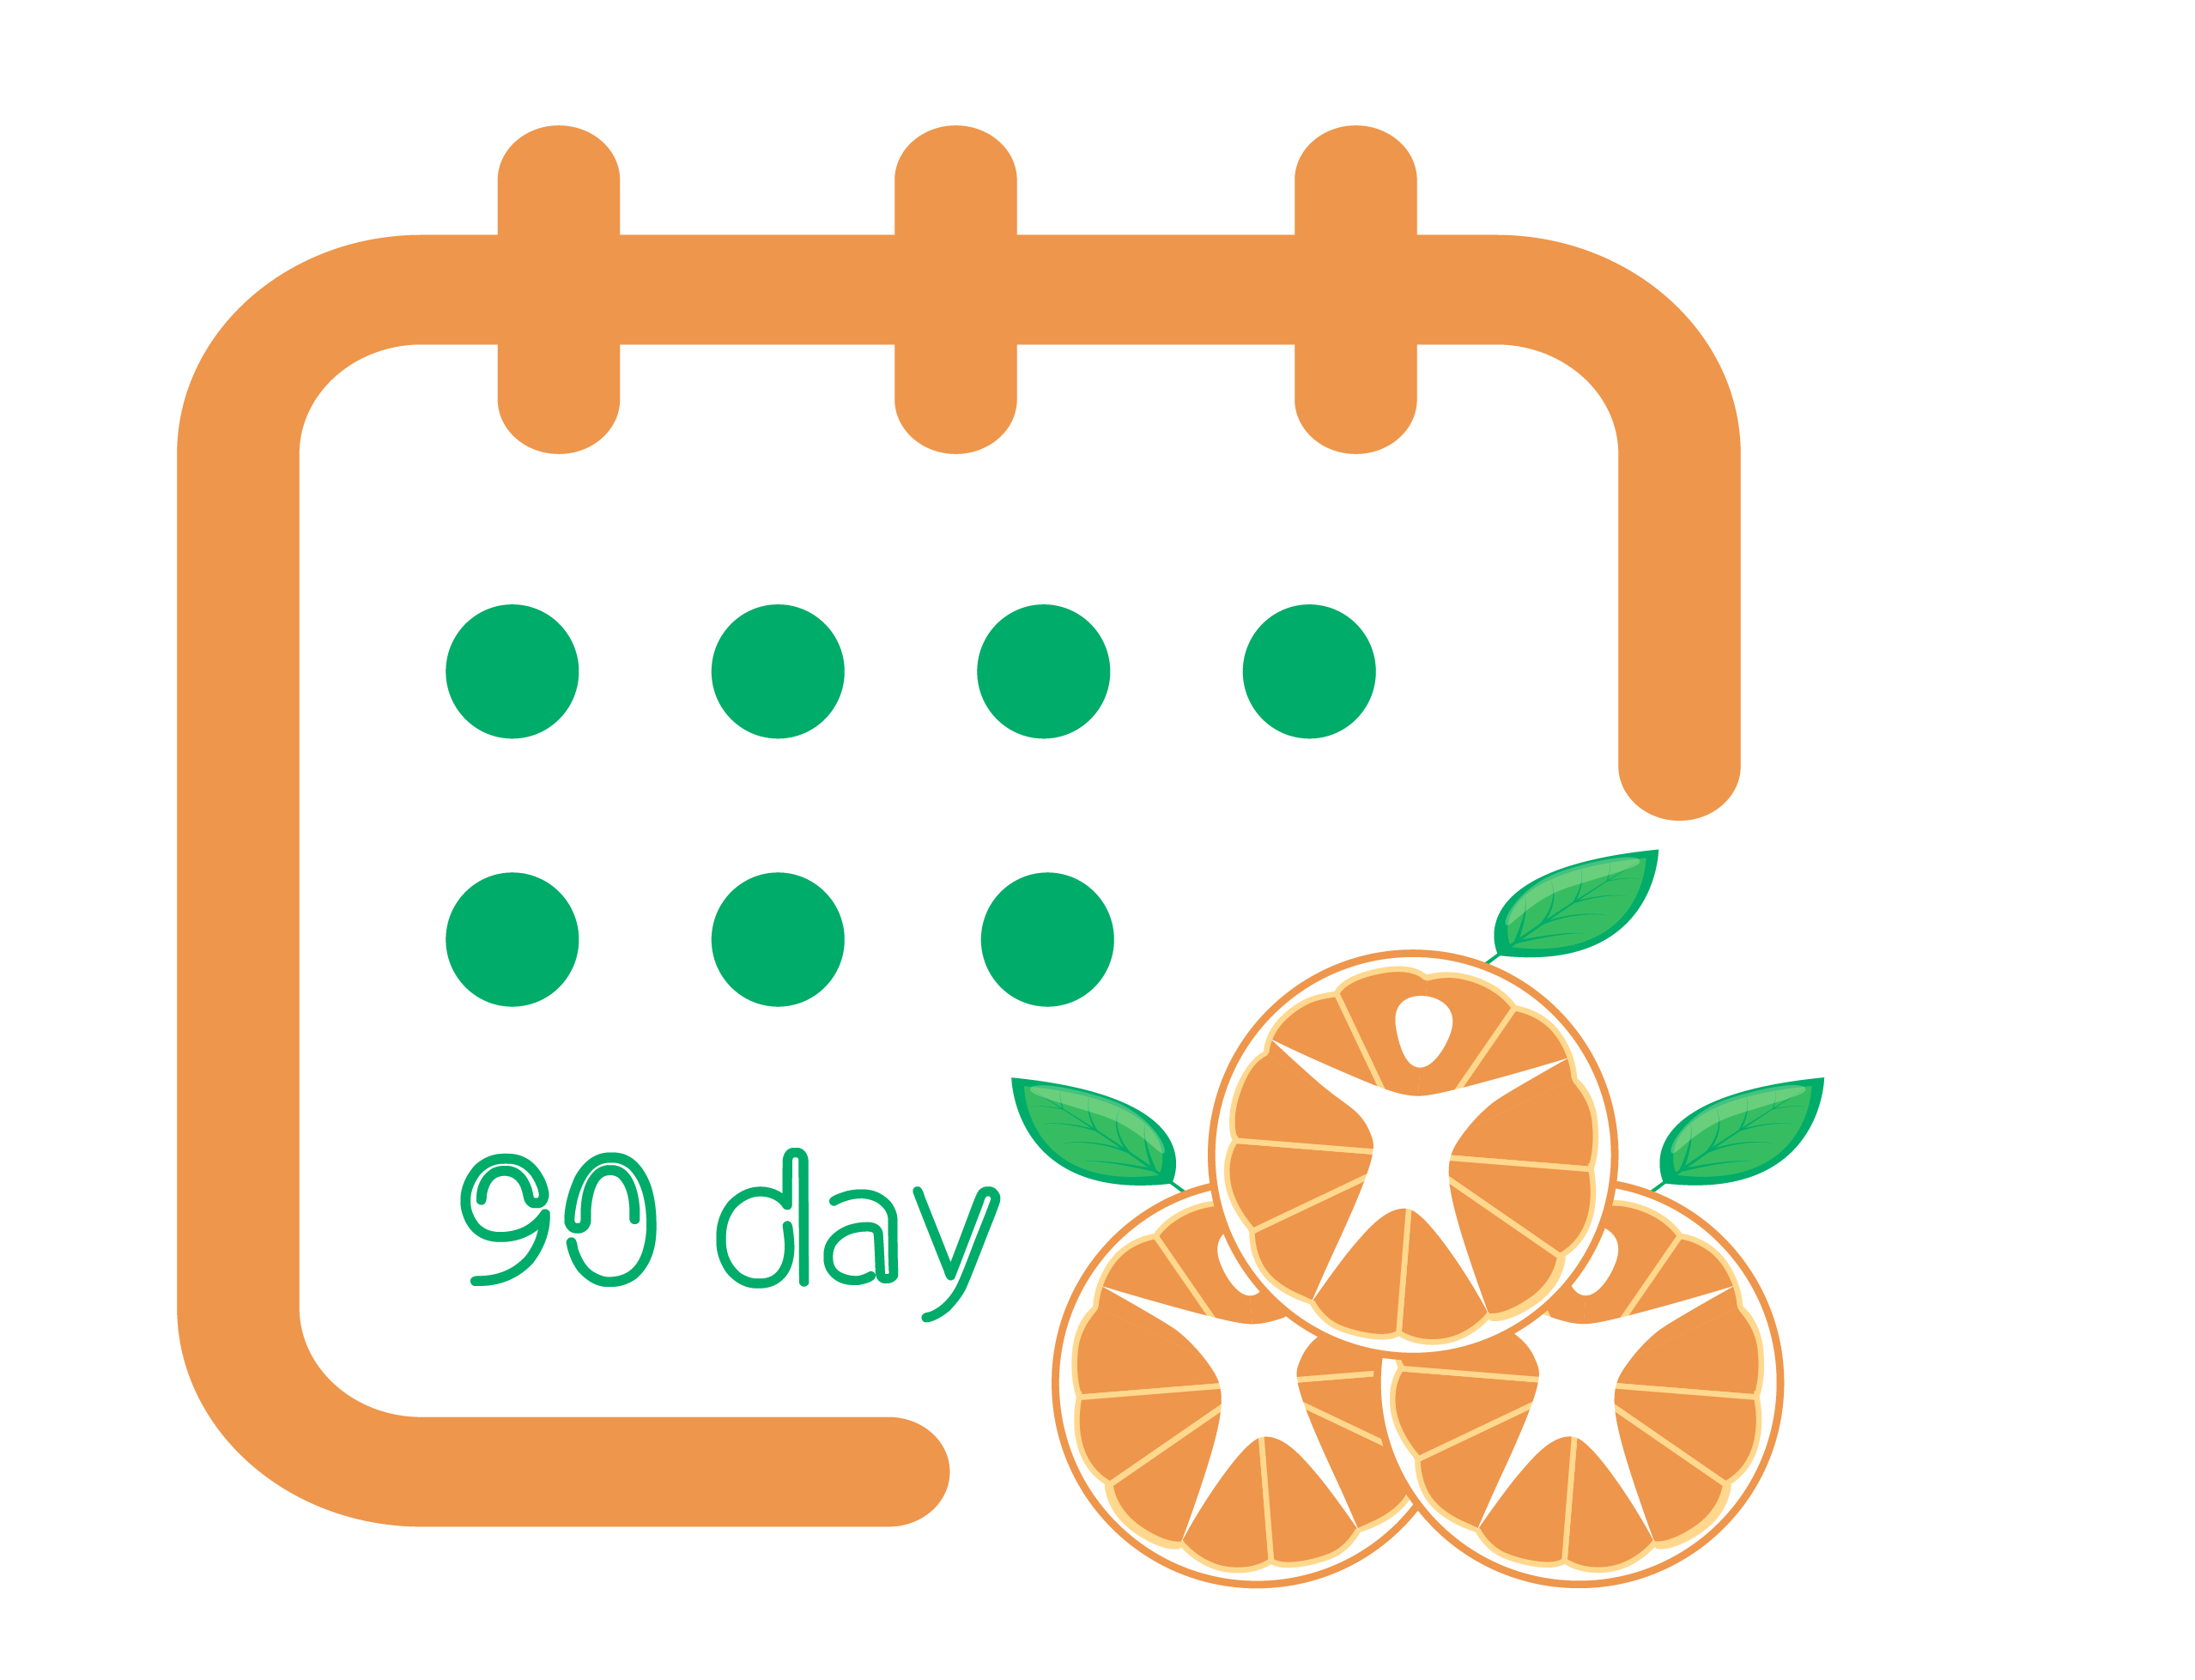 03_90 Day WILDFIT Program (2)